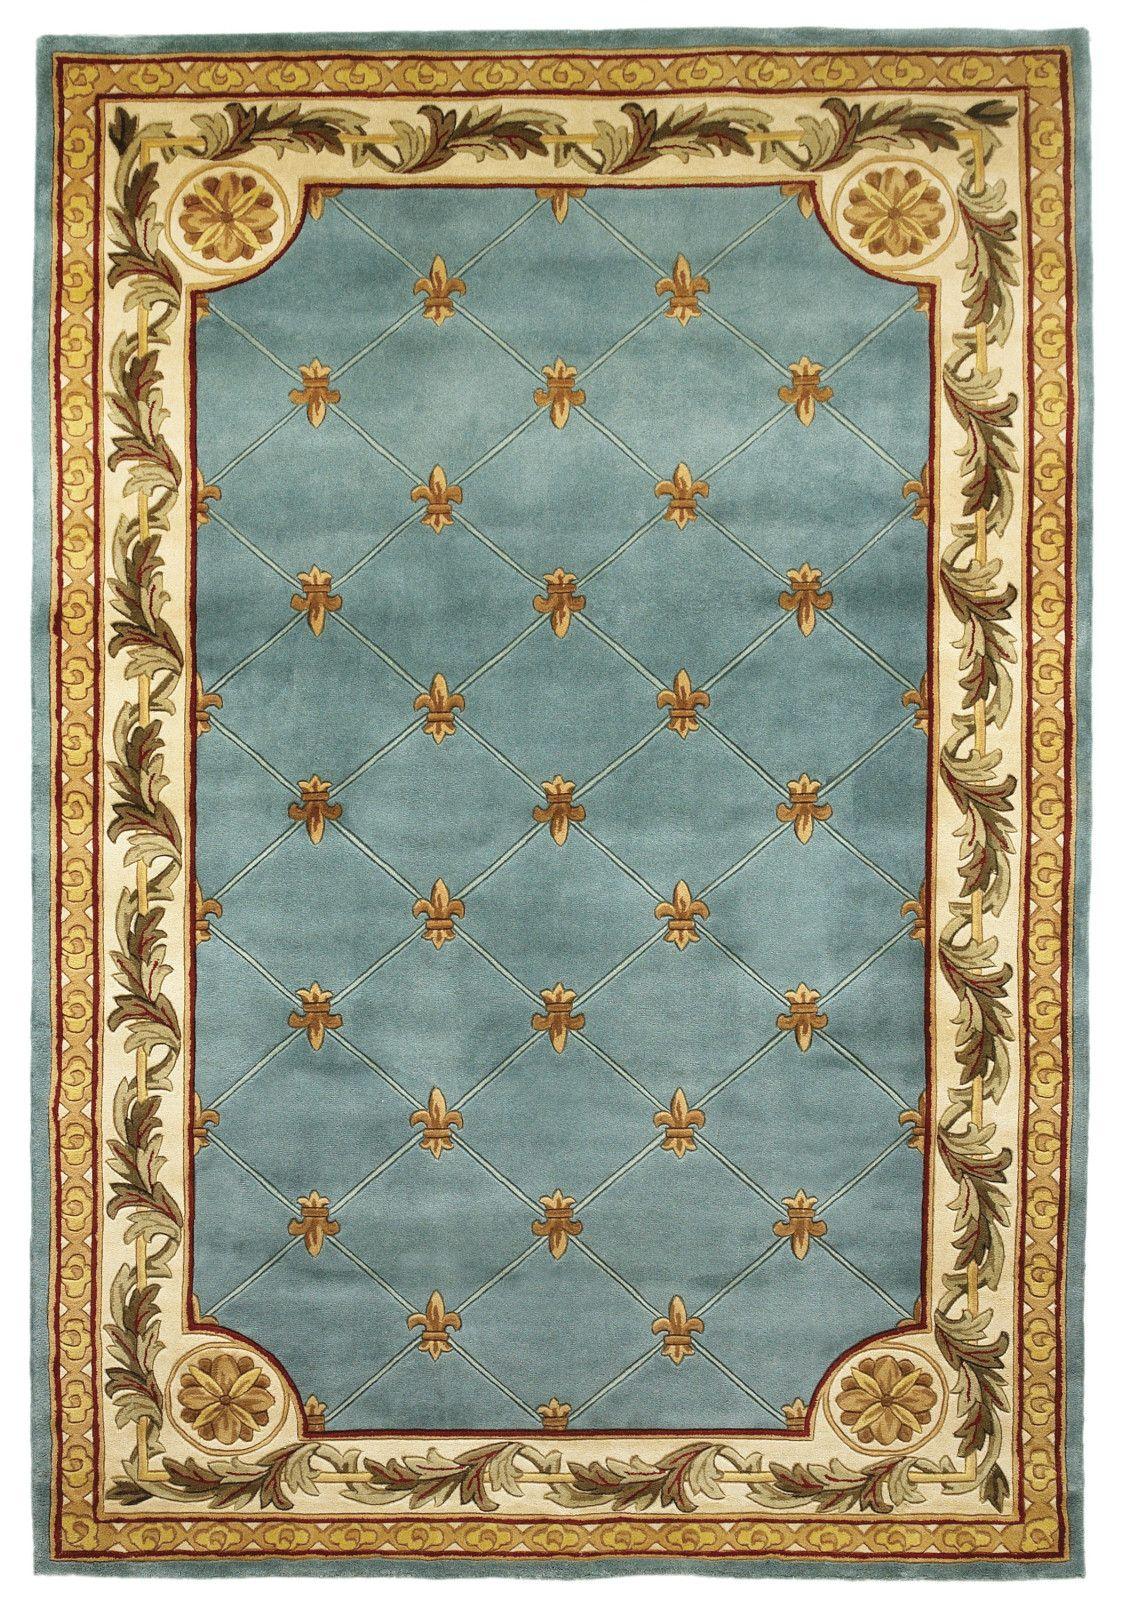 Kas Jewel 0305 Wedgewood Blue Fleur De Lis Area Rug Kas Rugs Rugs Blue Area Rugs Fleur de lis area rug